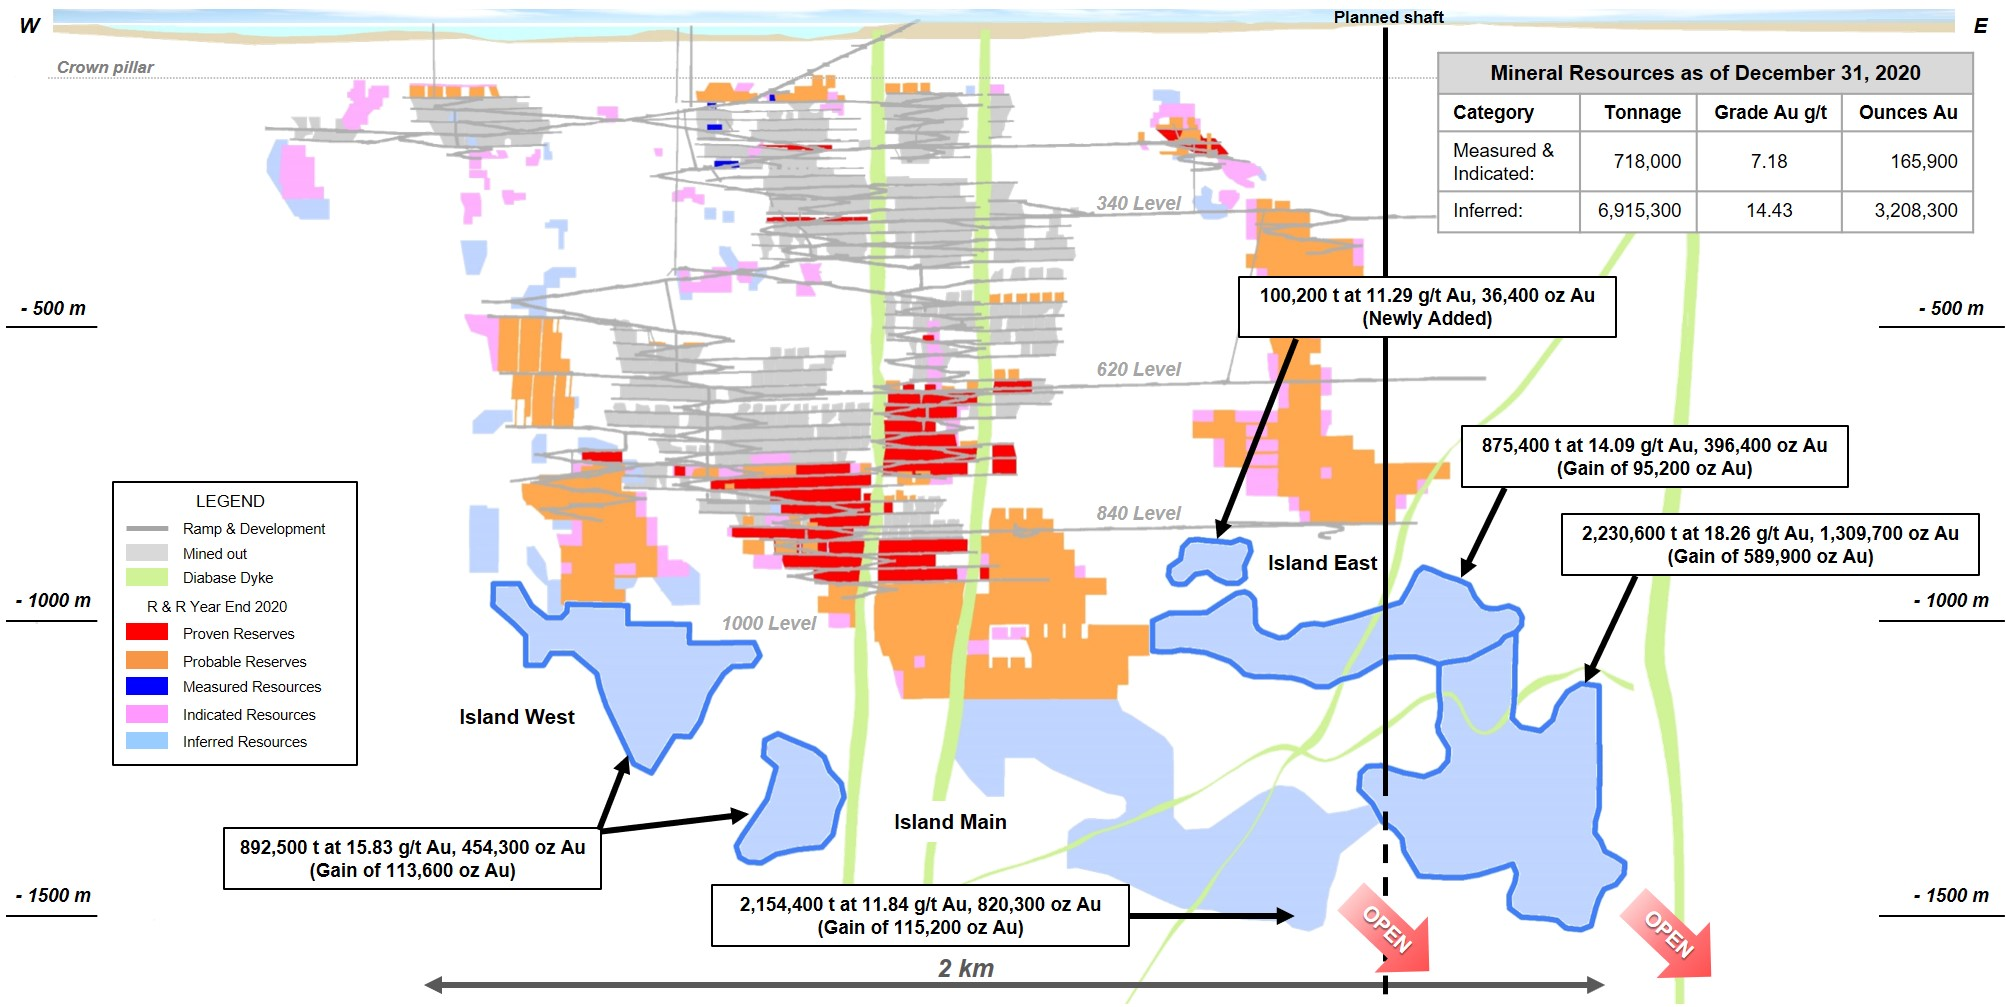 Figure 2: Island Gold Mine Main Zone Longitudinal - 2020 Mineral Resources